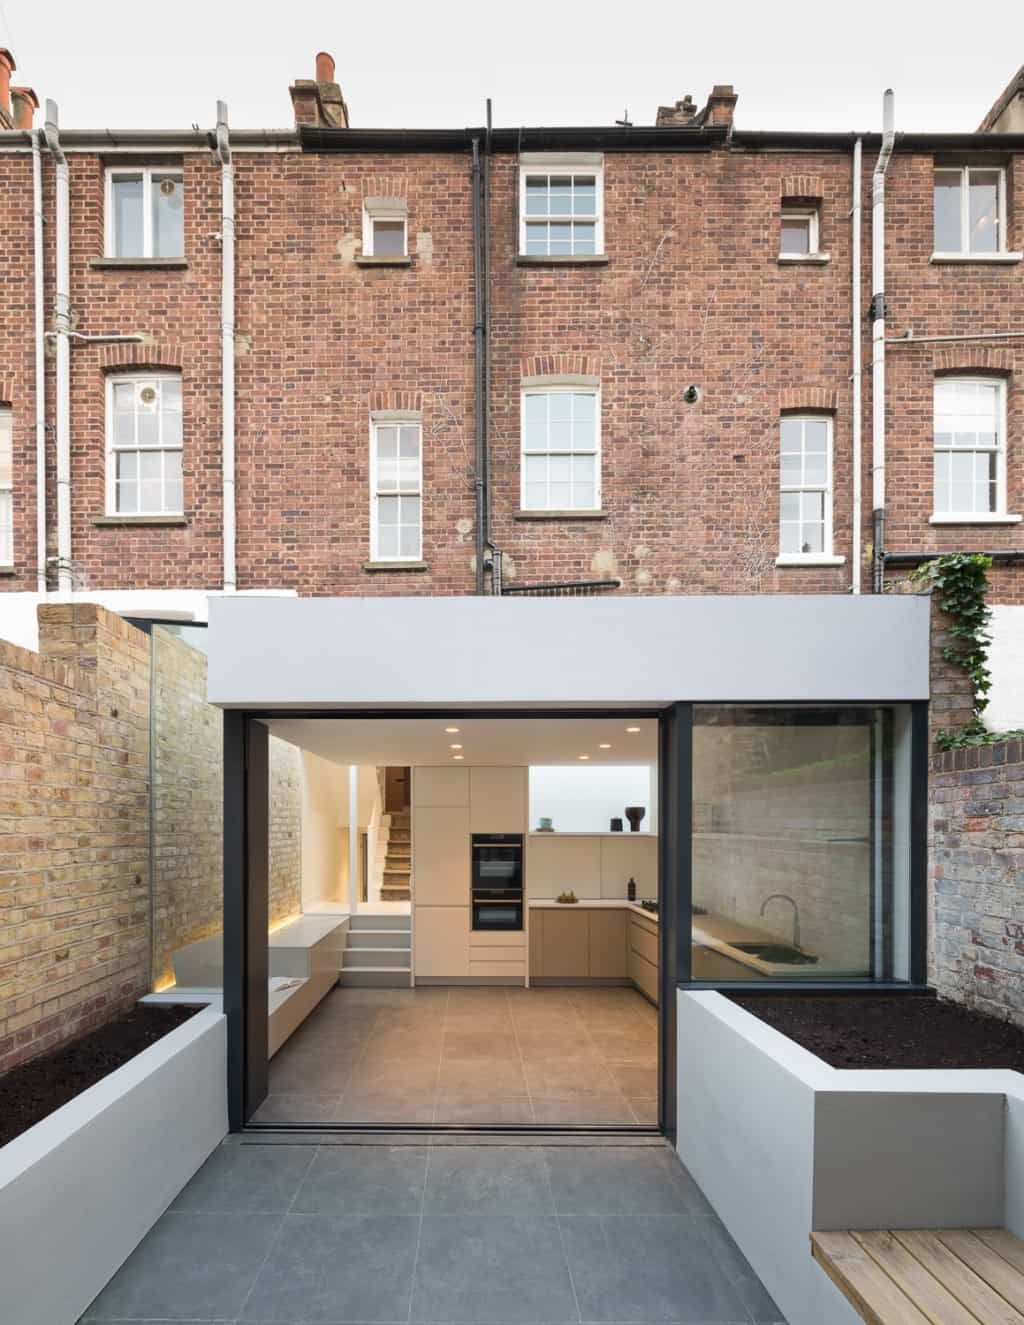 Basement extension architects london #extensionideas